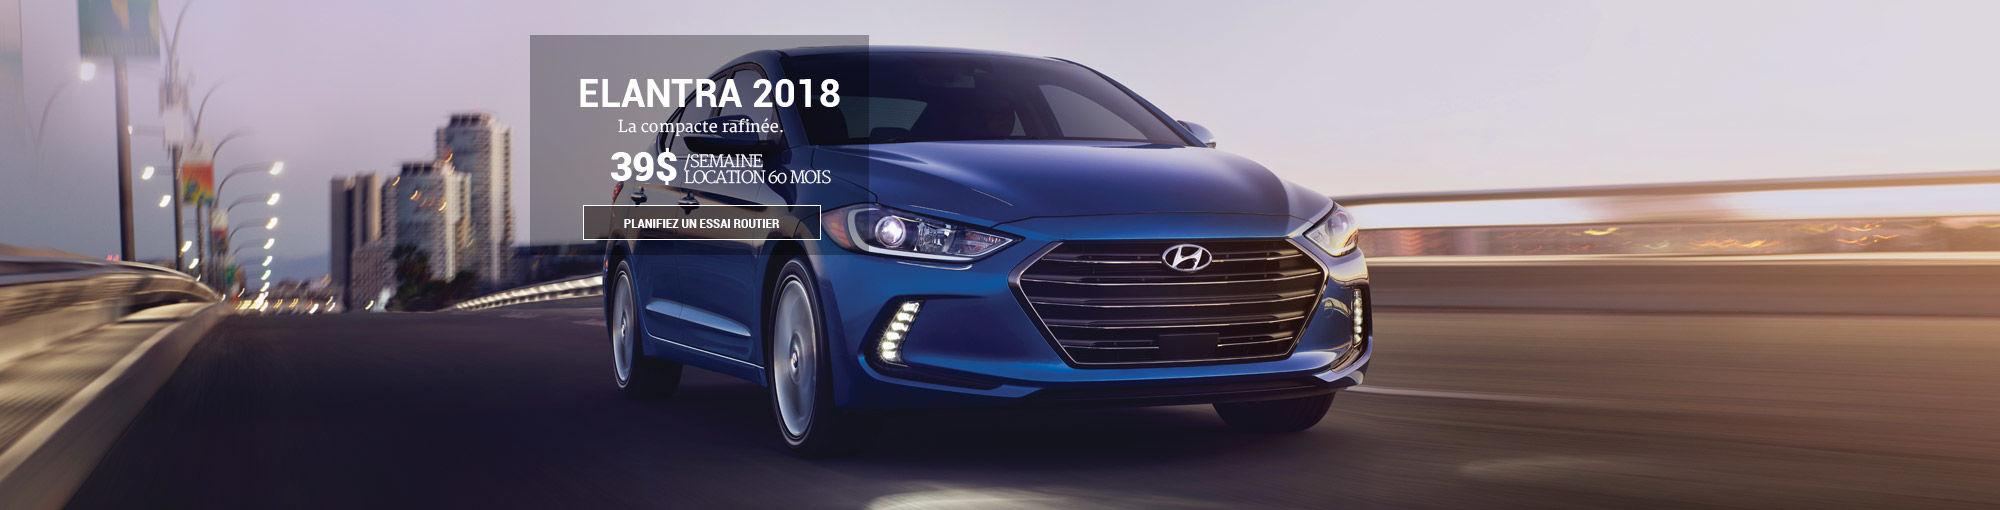 Hyundai elantra header 2018- juillet